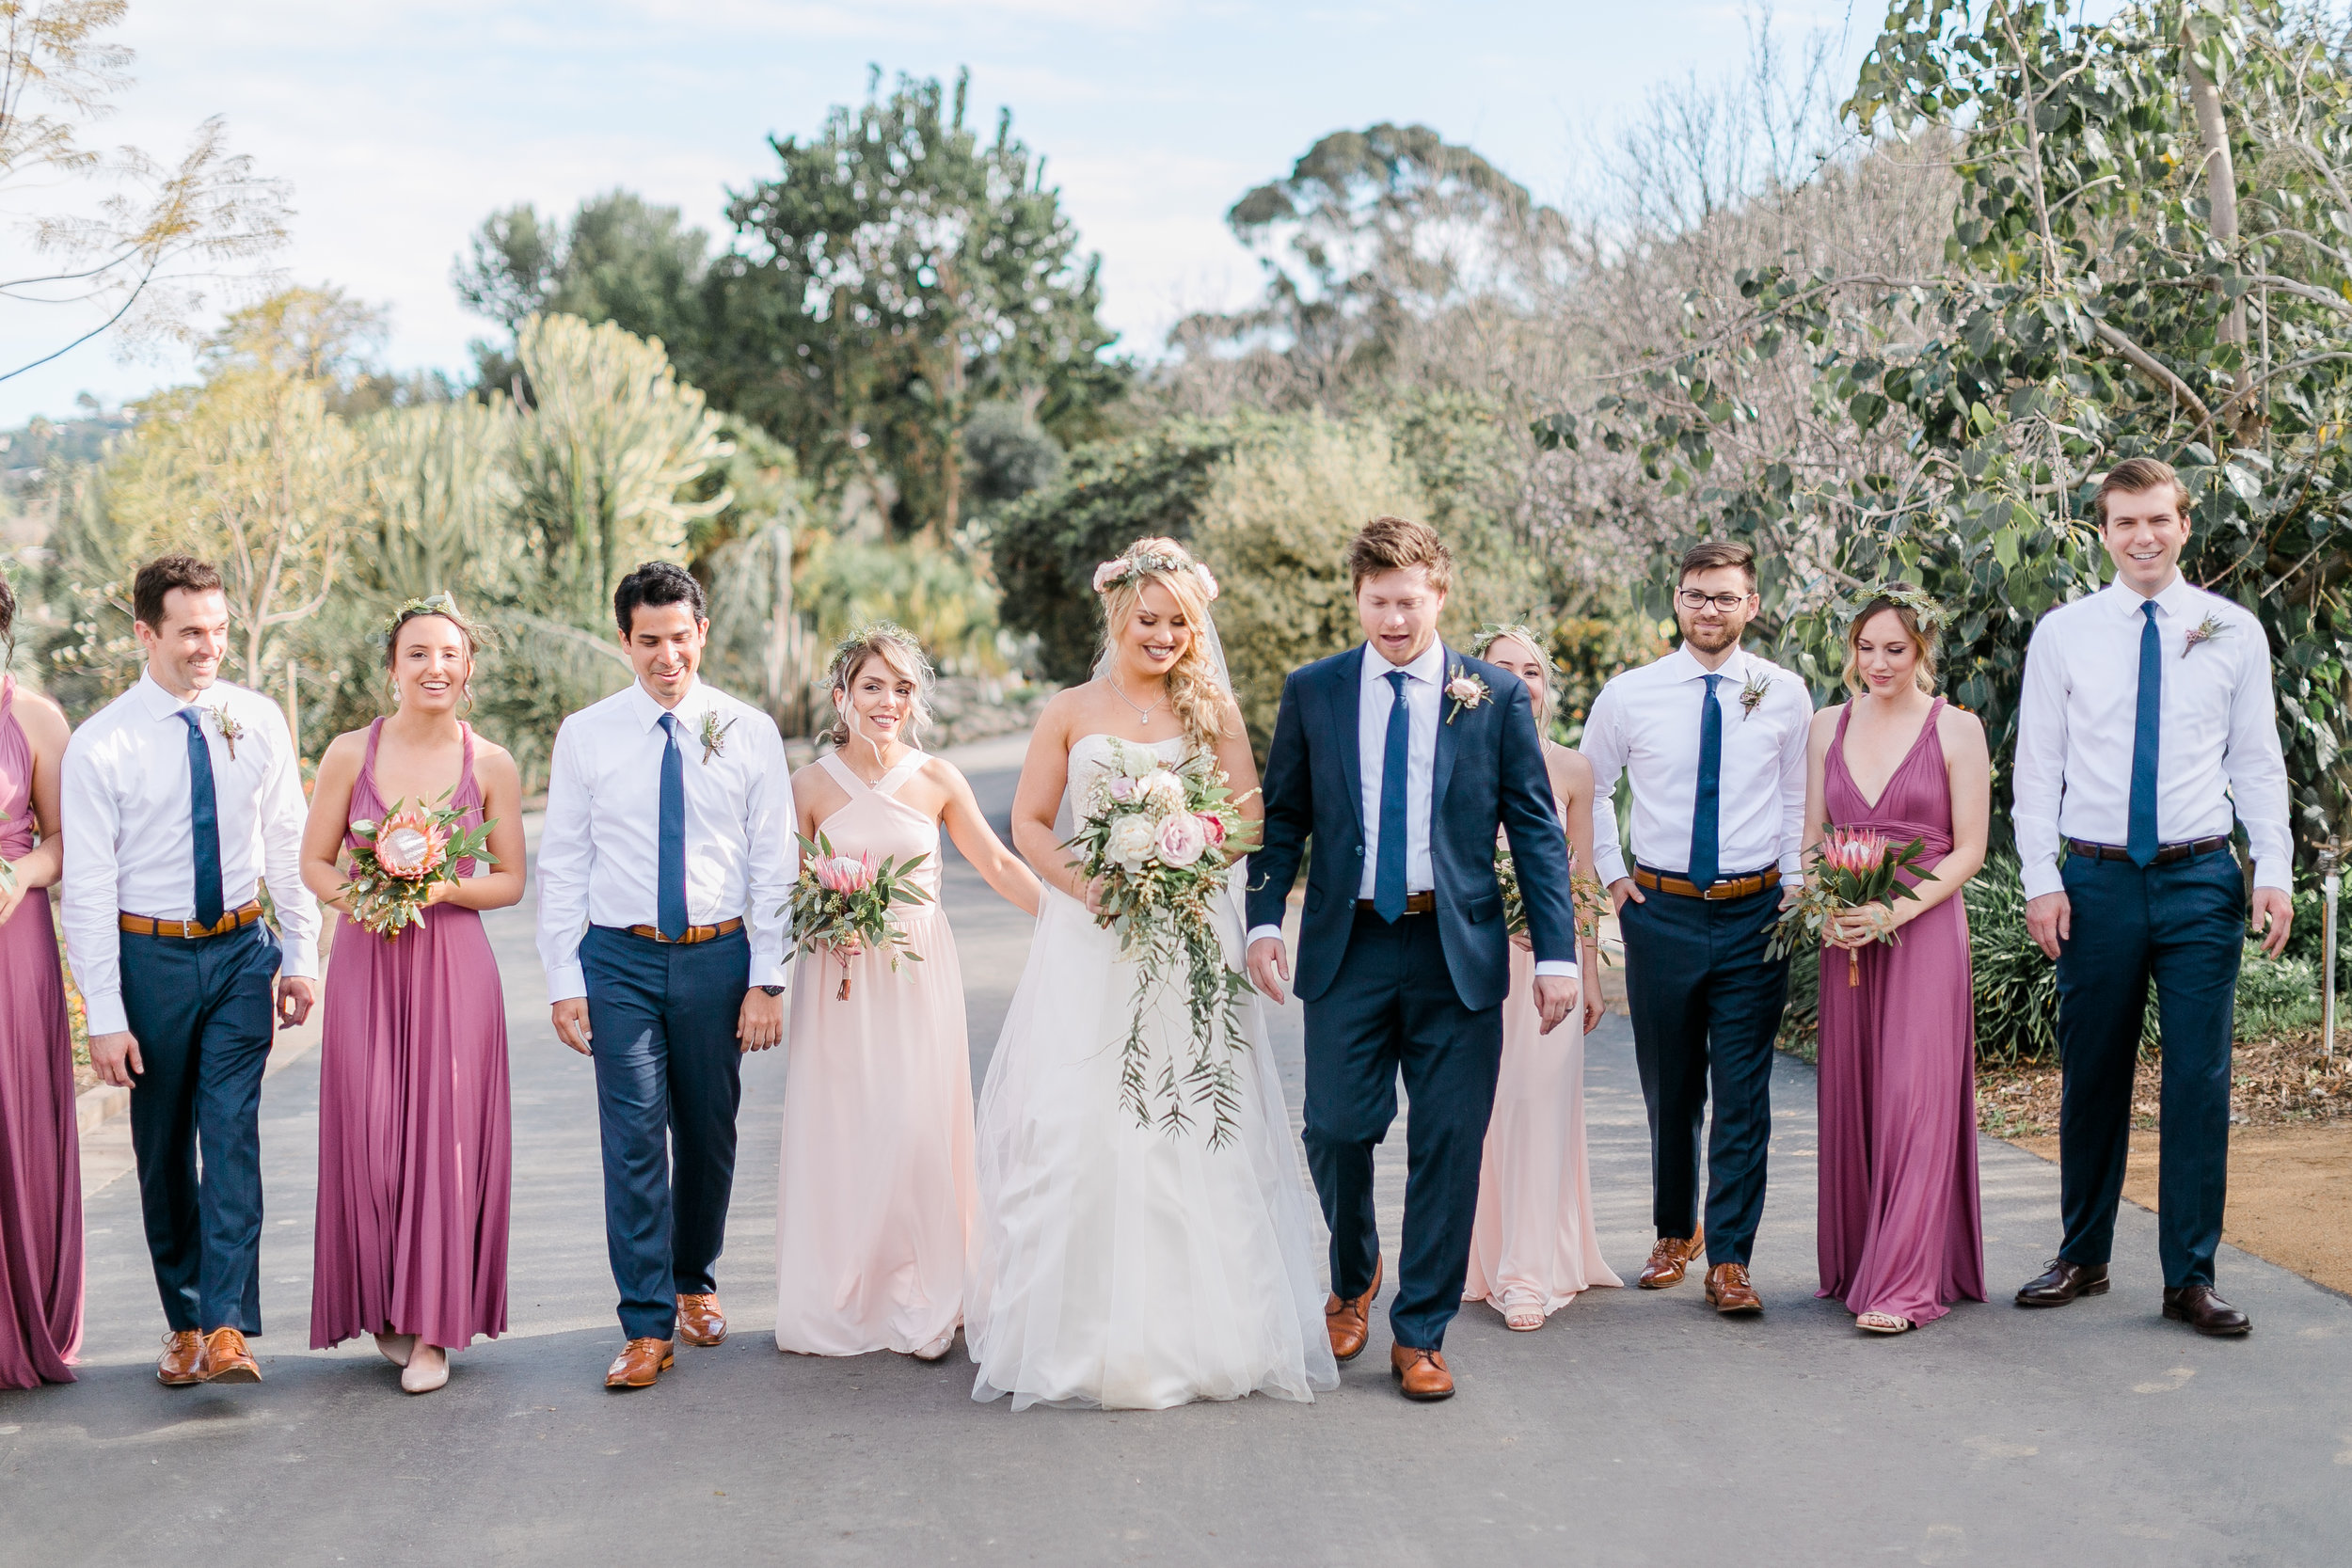 South-Coast-Botanic-Garden-Wedding-Planner39.jpg